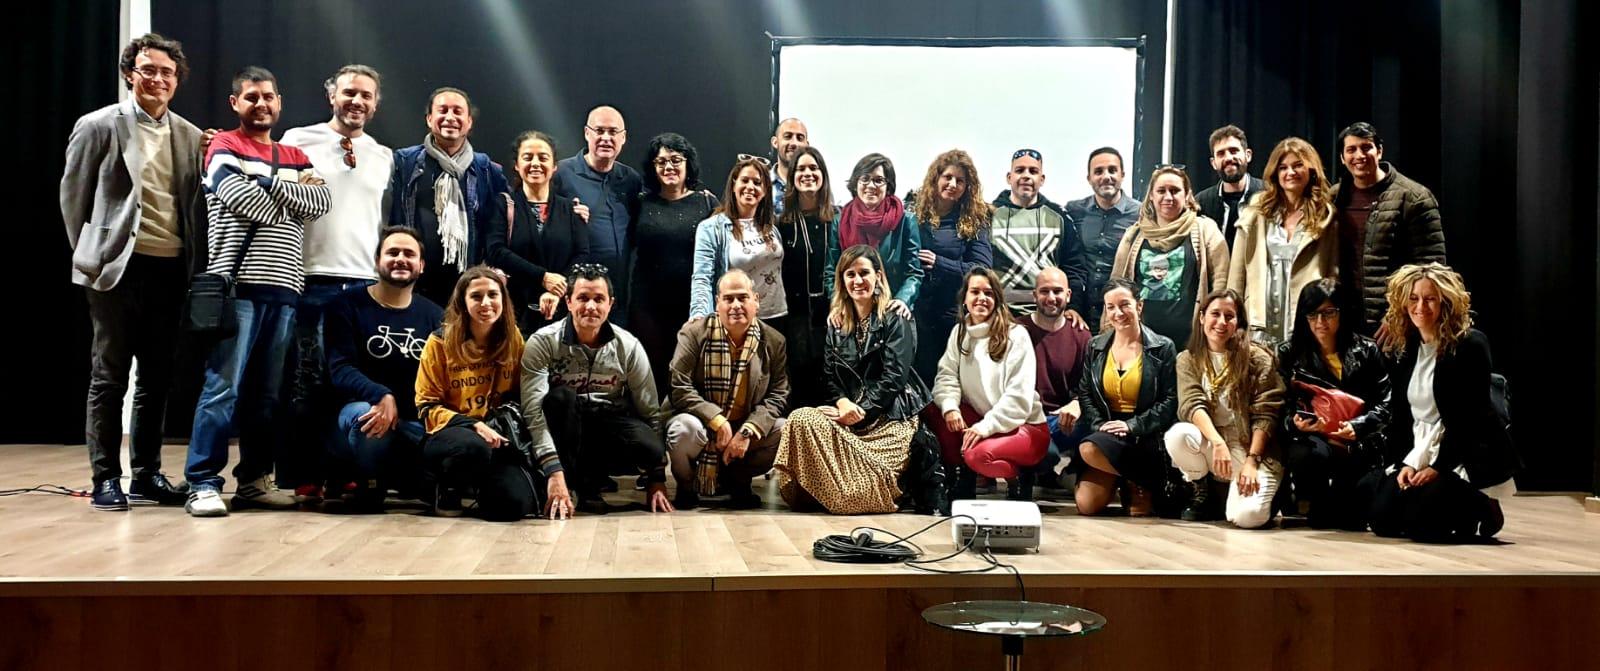 socios asamblea anual Comunitat Valenciana Travel Bloggers